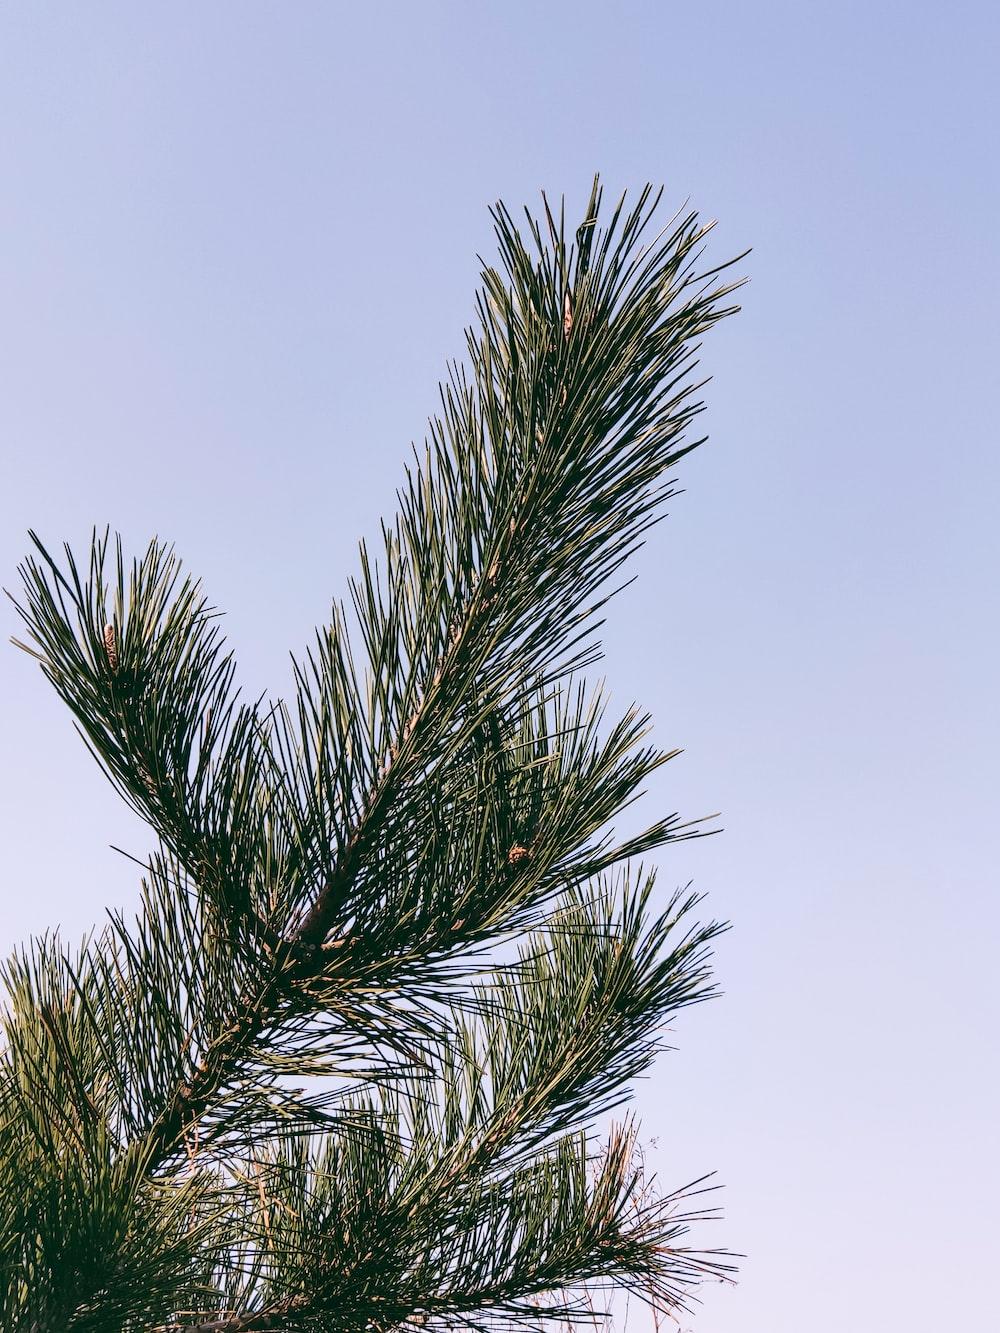 green pine tree under white sky